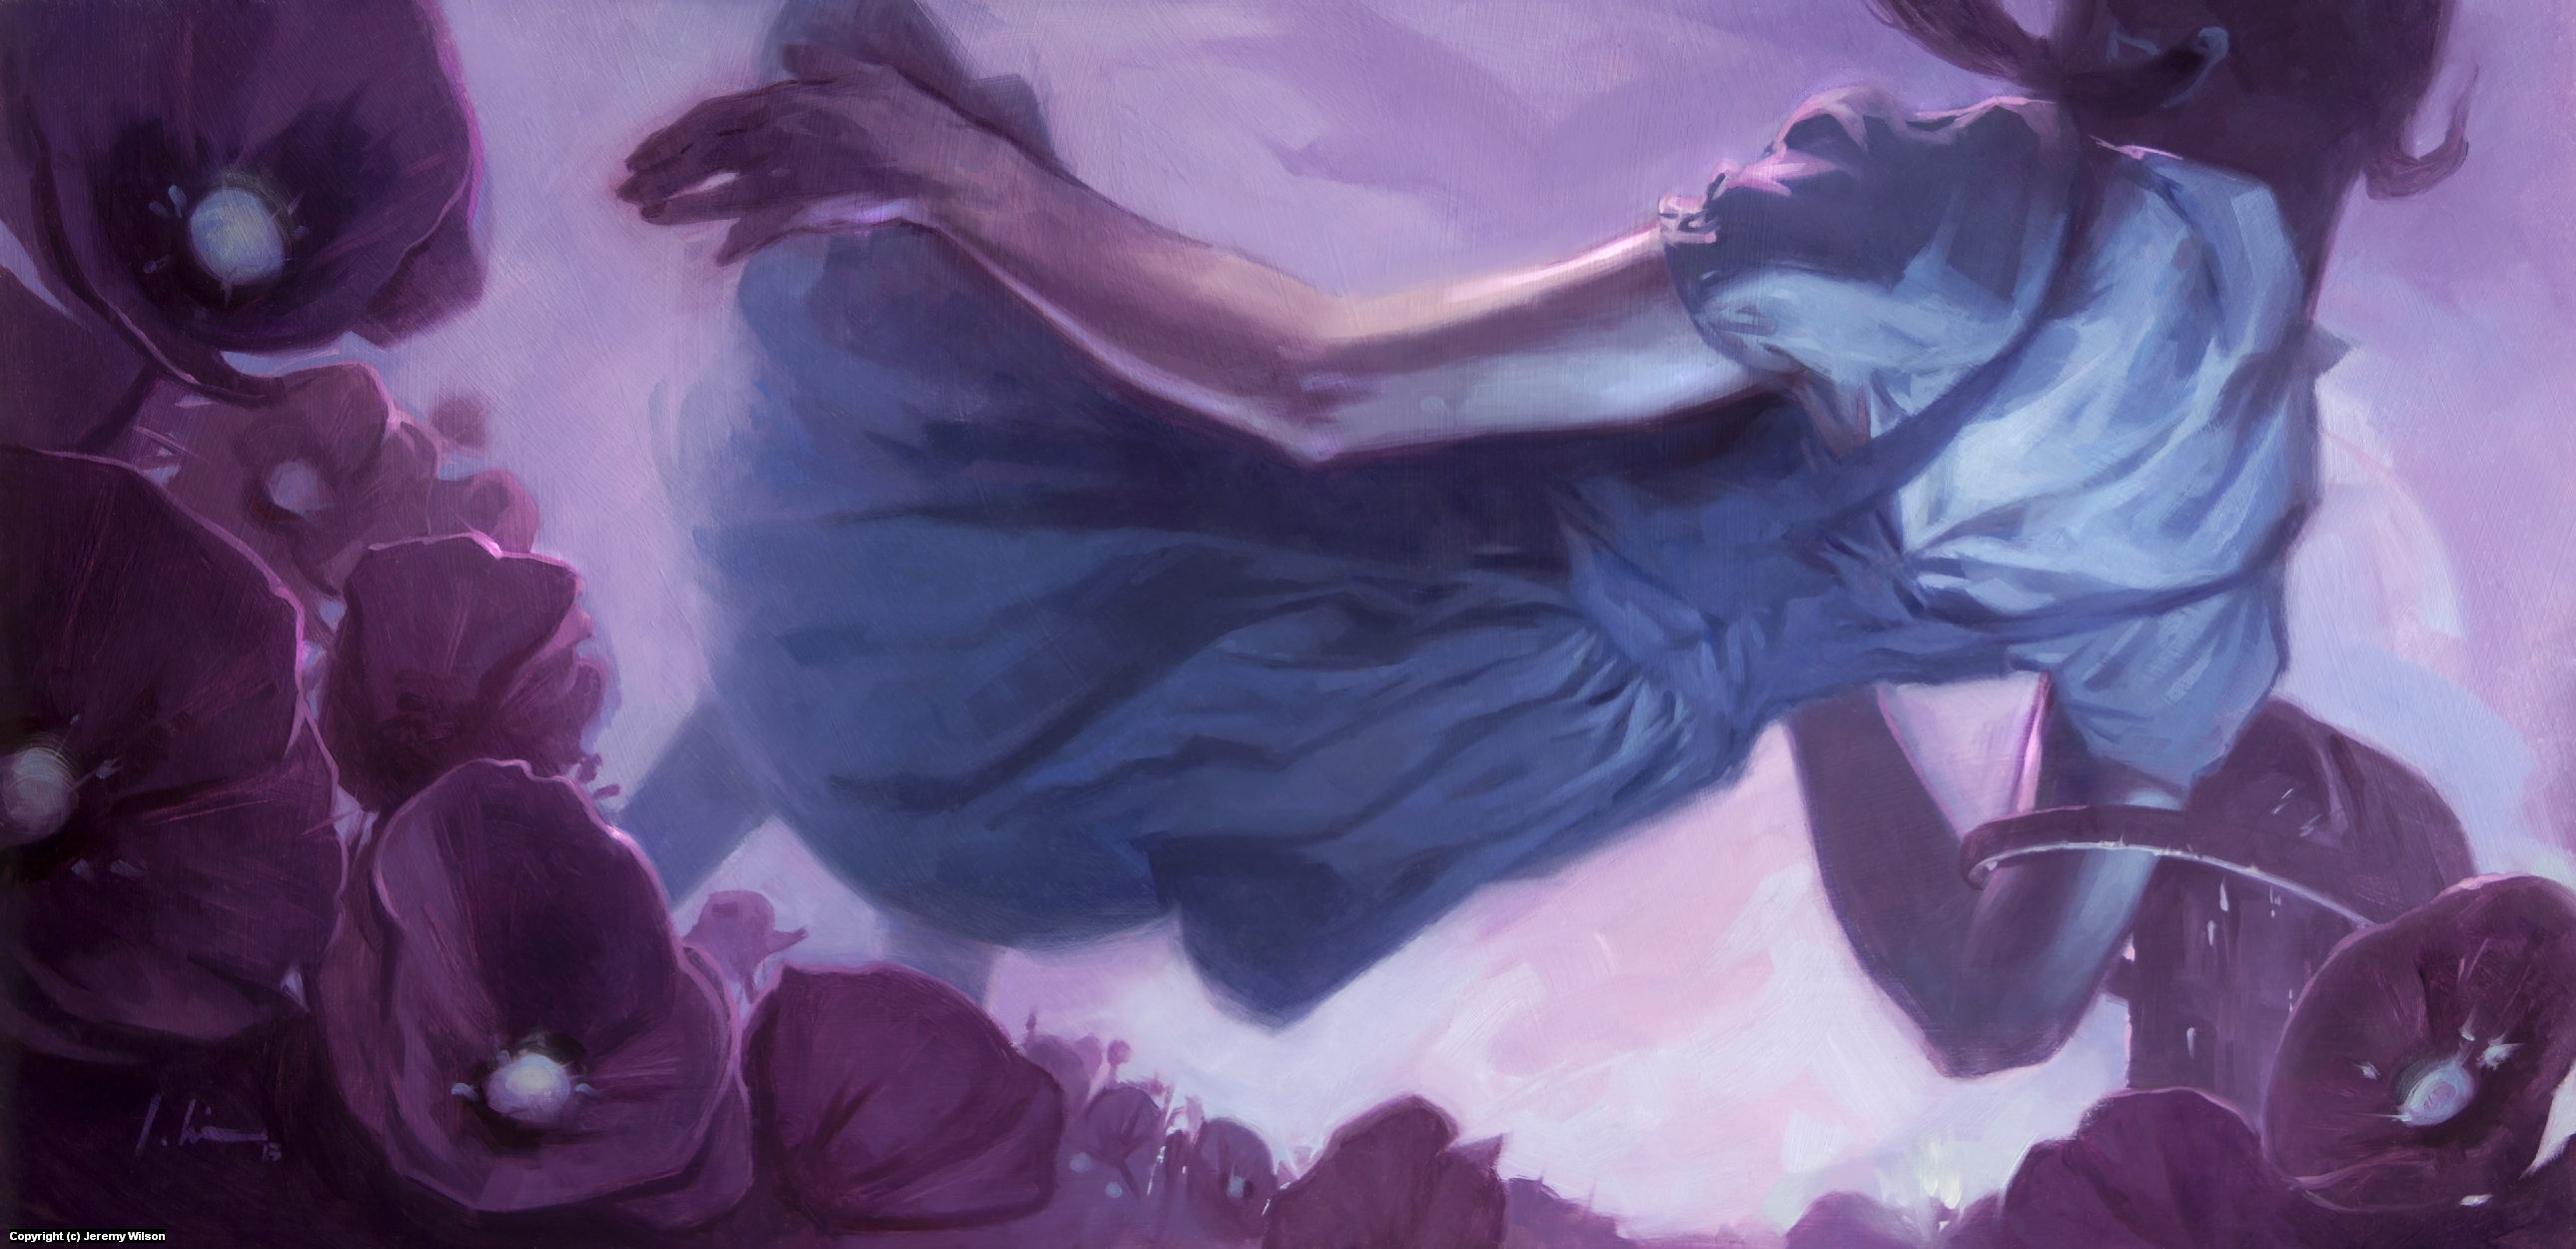 Sleep, Sleep Artwork by Jeremy Wilson